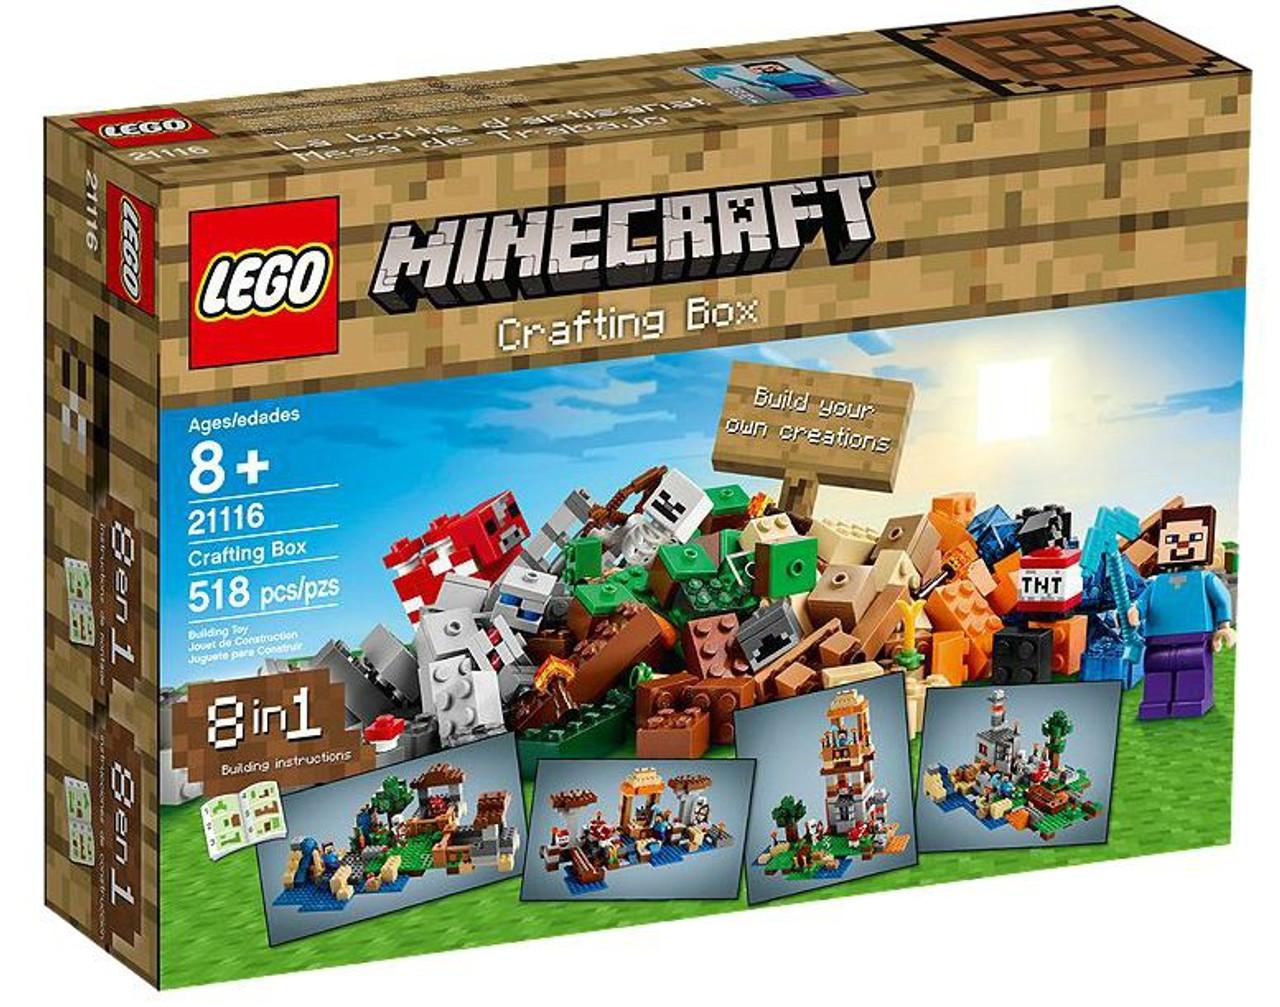 LEGO Minecraft Crafting Box Set #21116